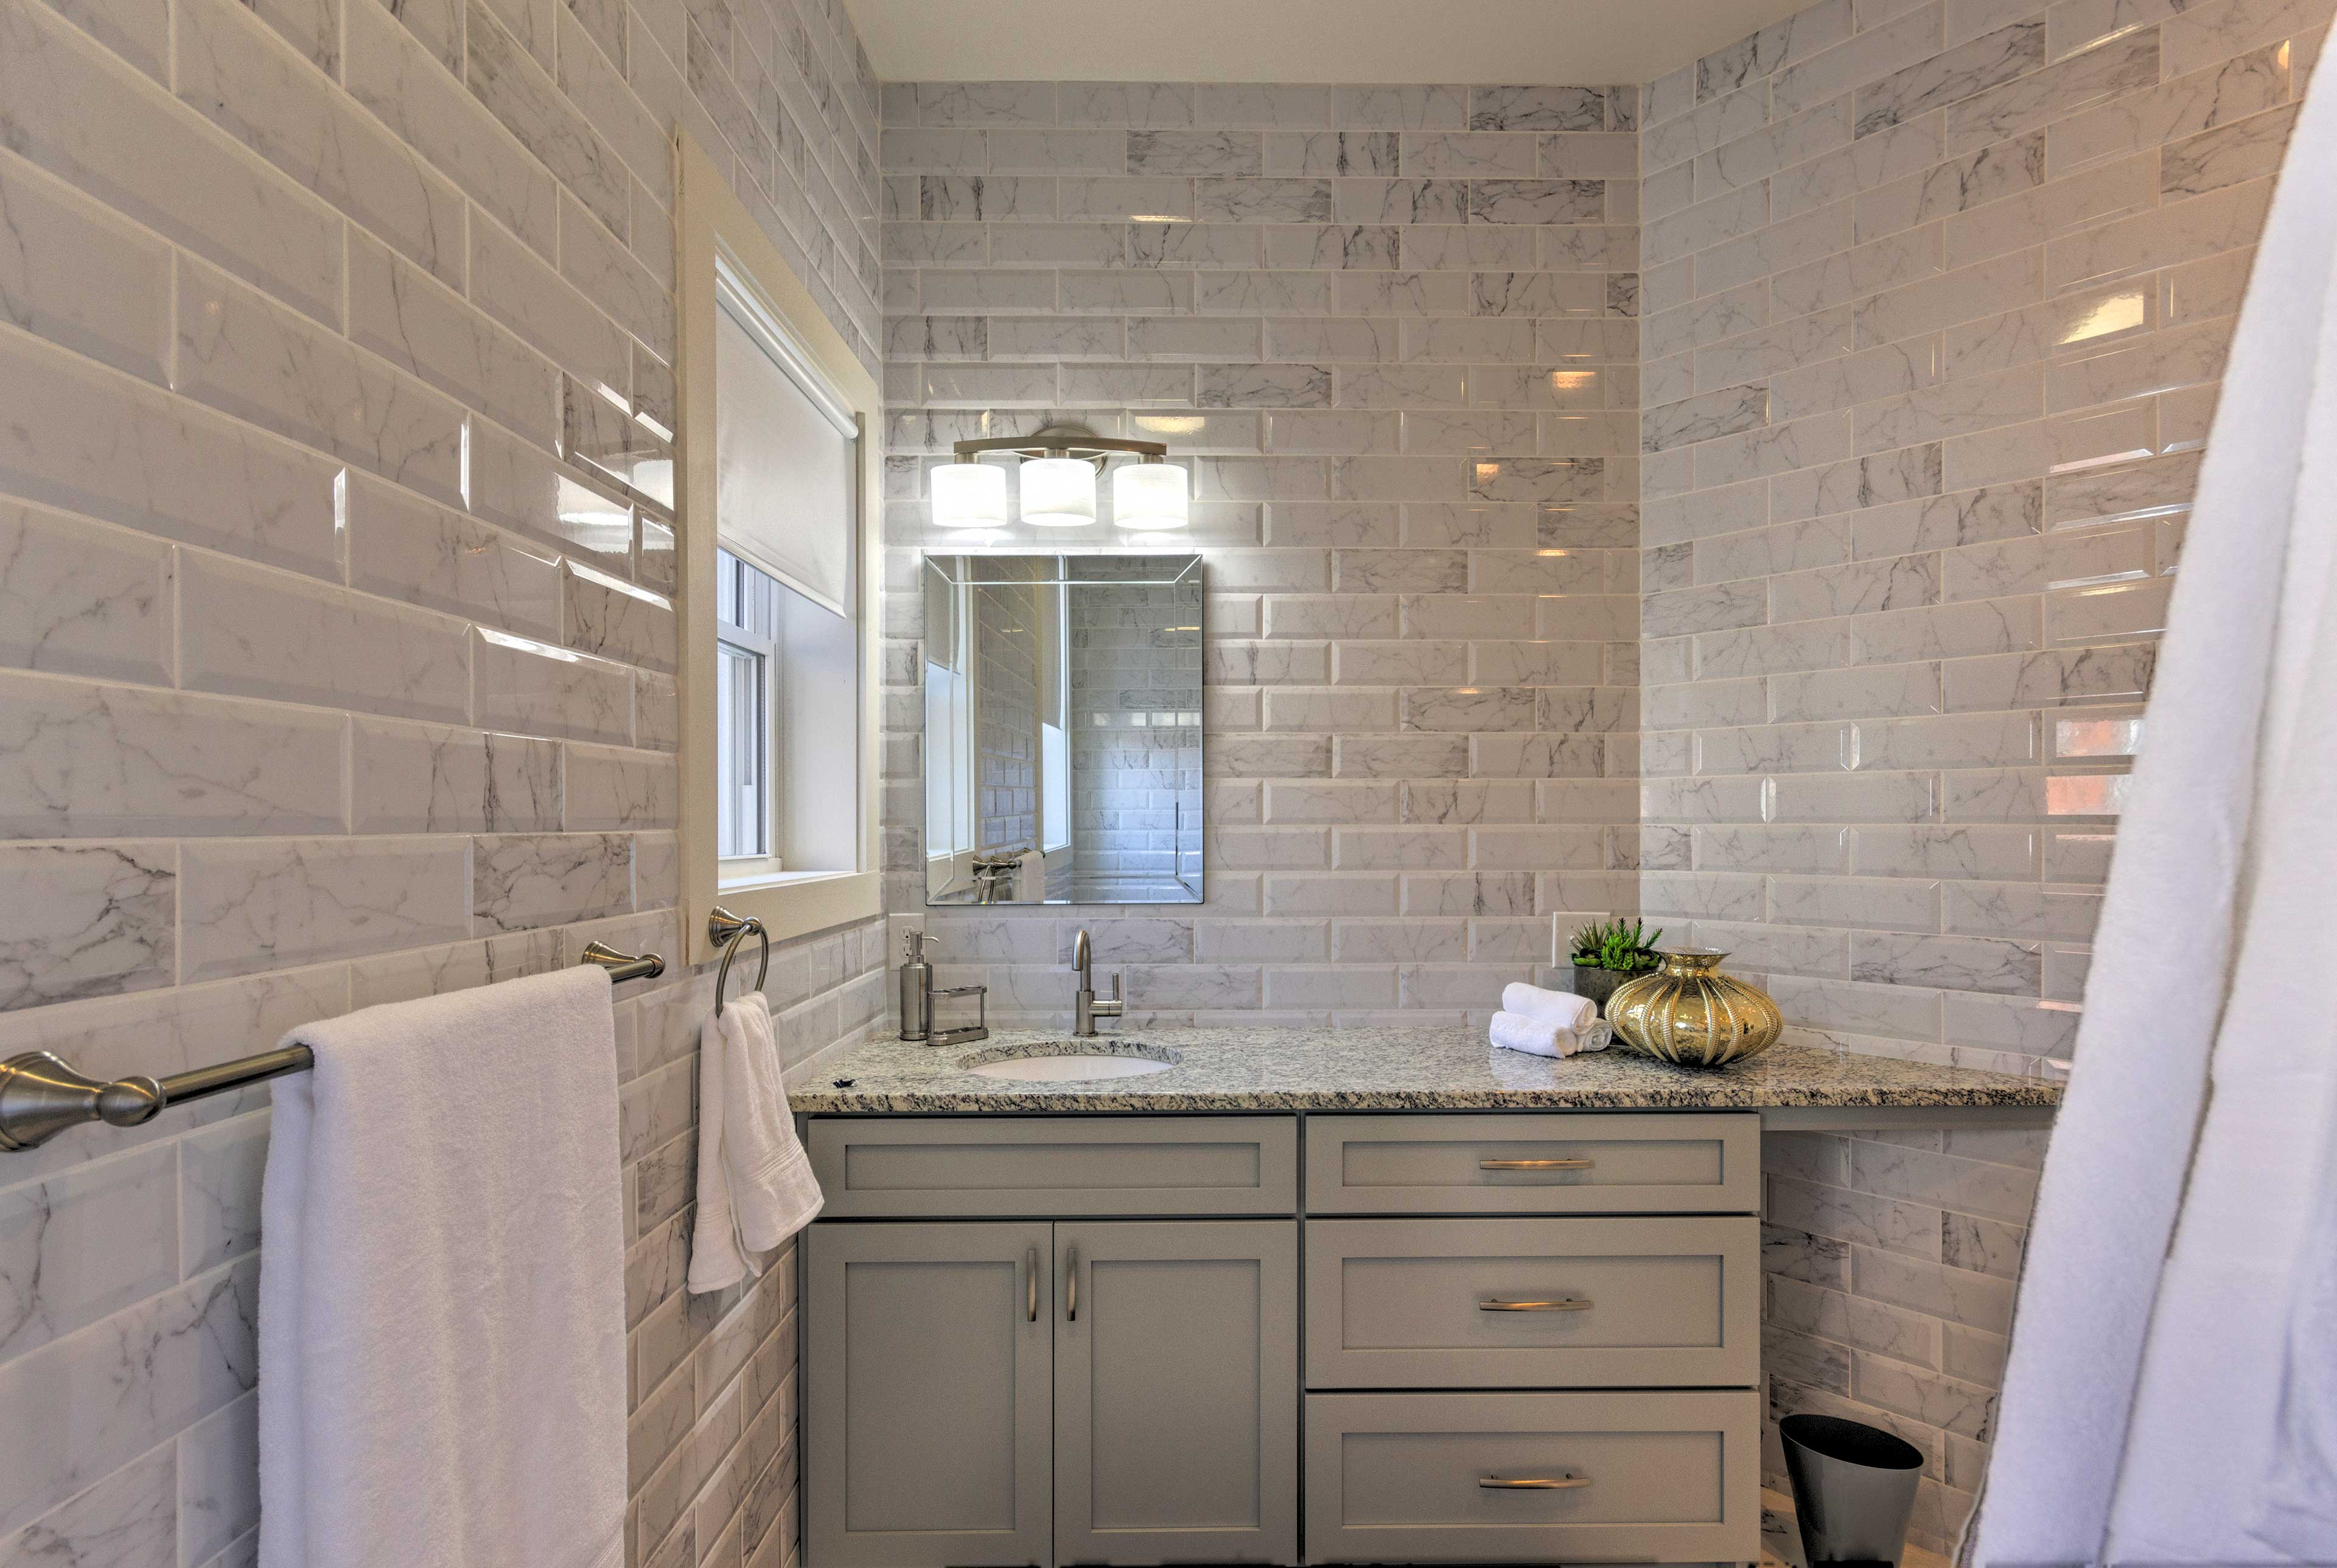 Tiled marble walls frame the bathroom.